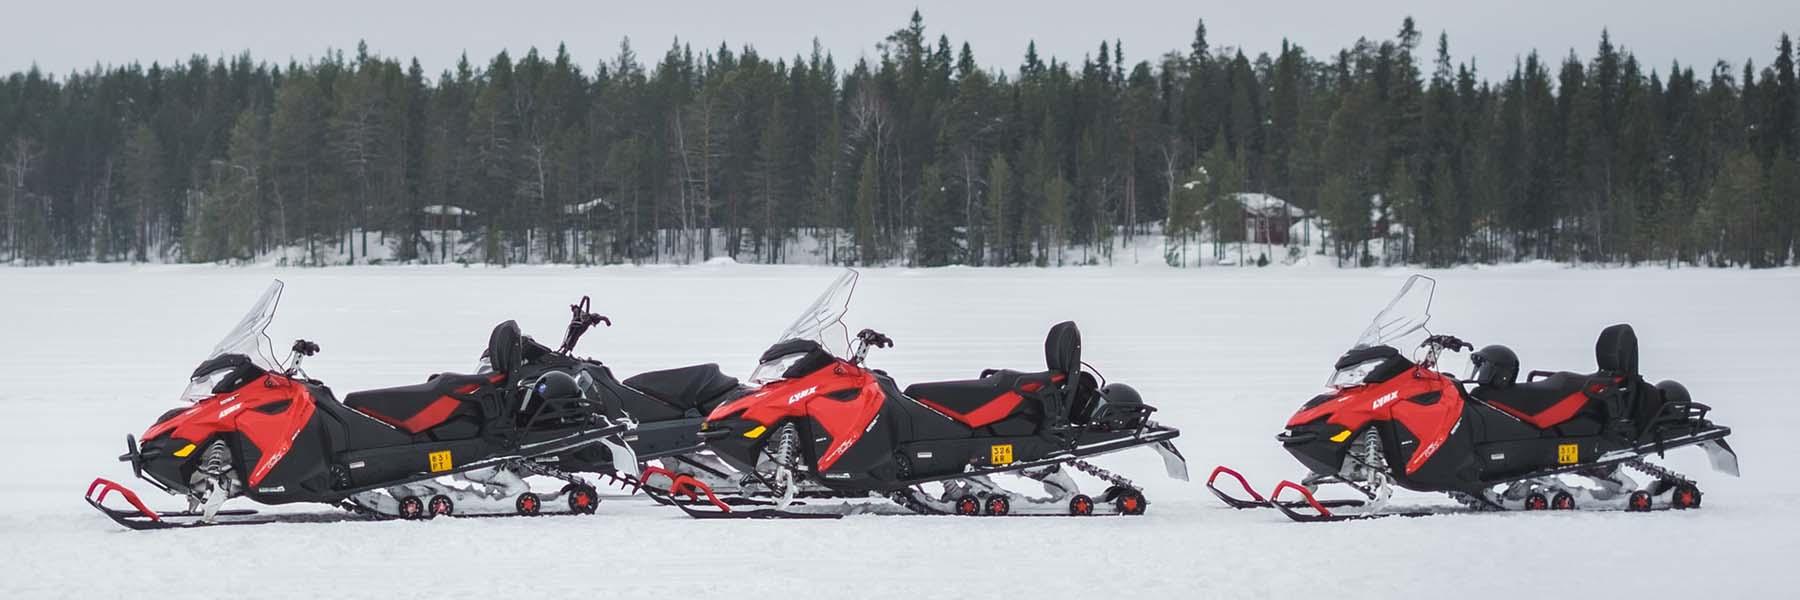 Snow activities like snowmobile, dog sledding, reindeer sledding etc